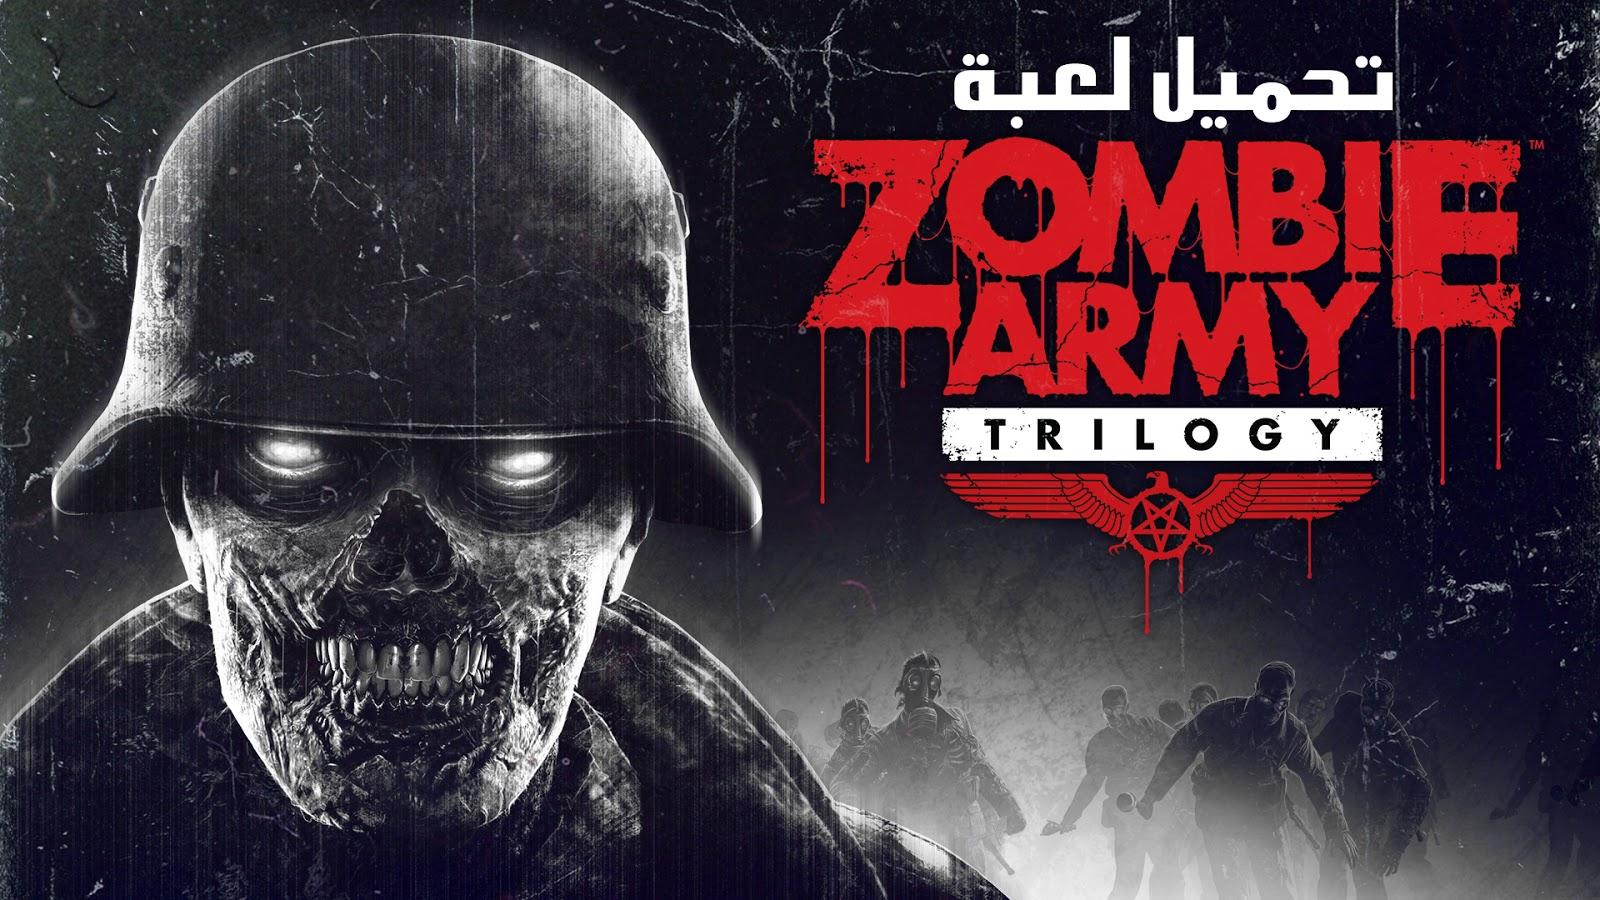 تحميل لعبة Zombie Army Trilogy برابط واحد مباشر للكمبيوتر